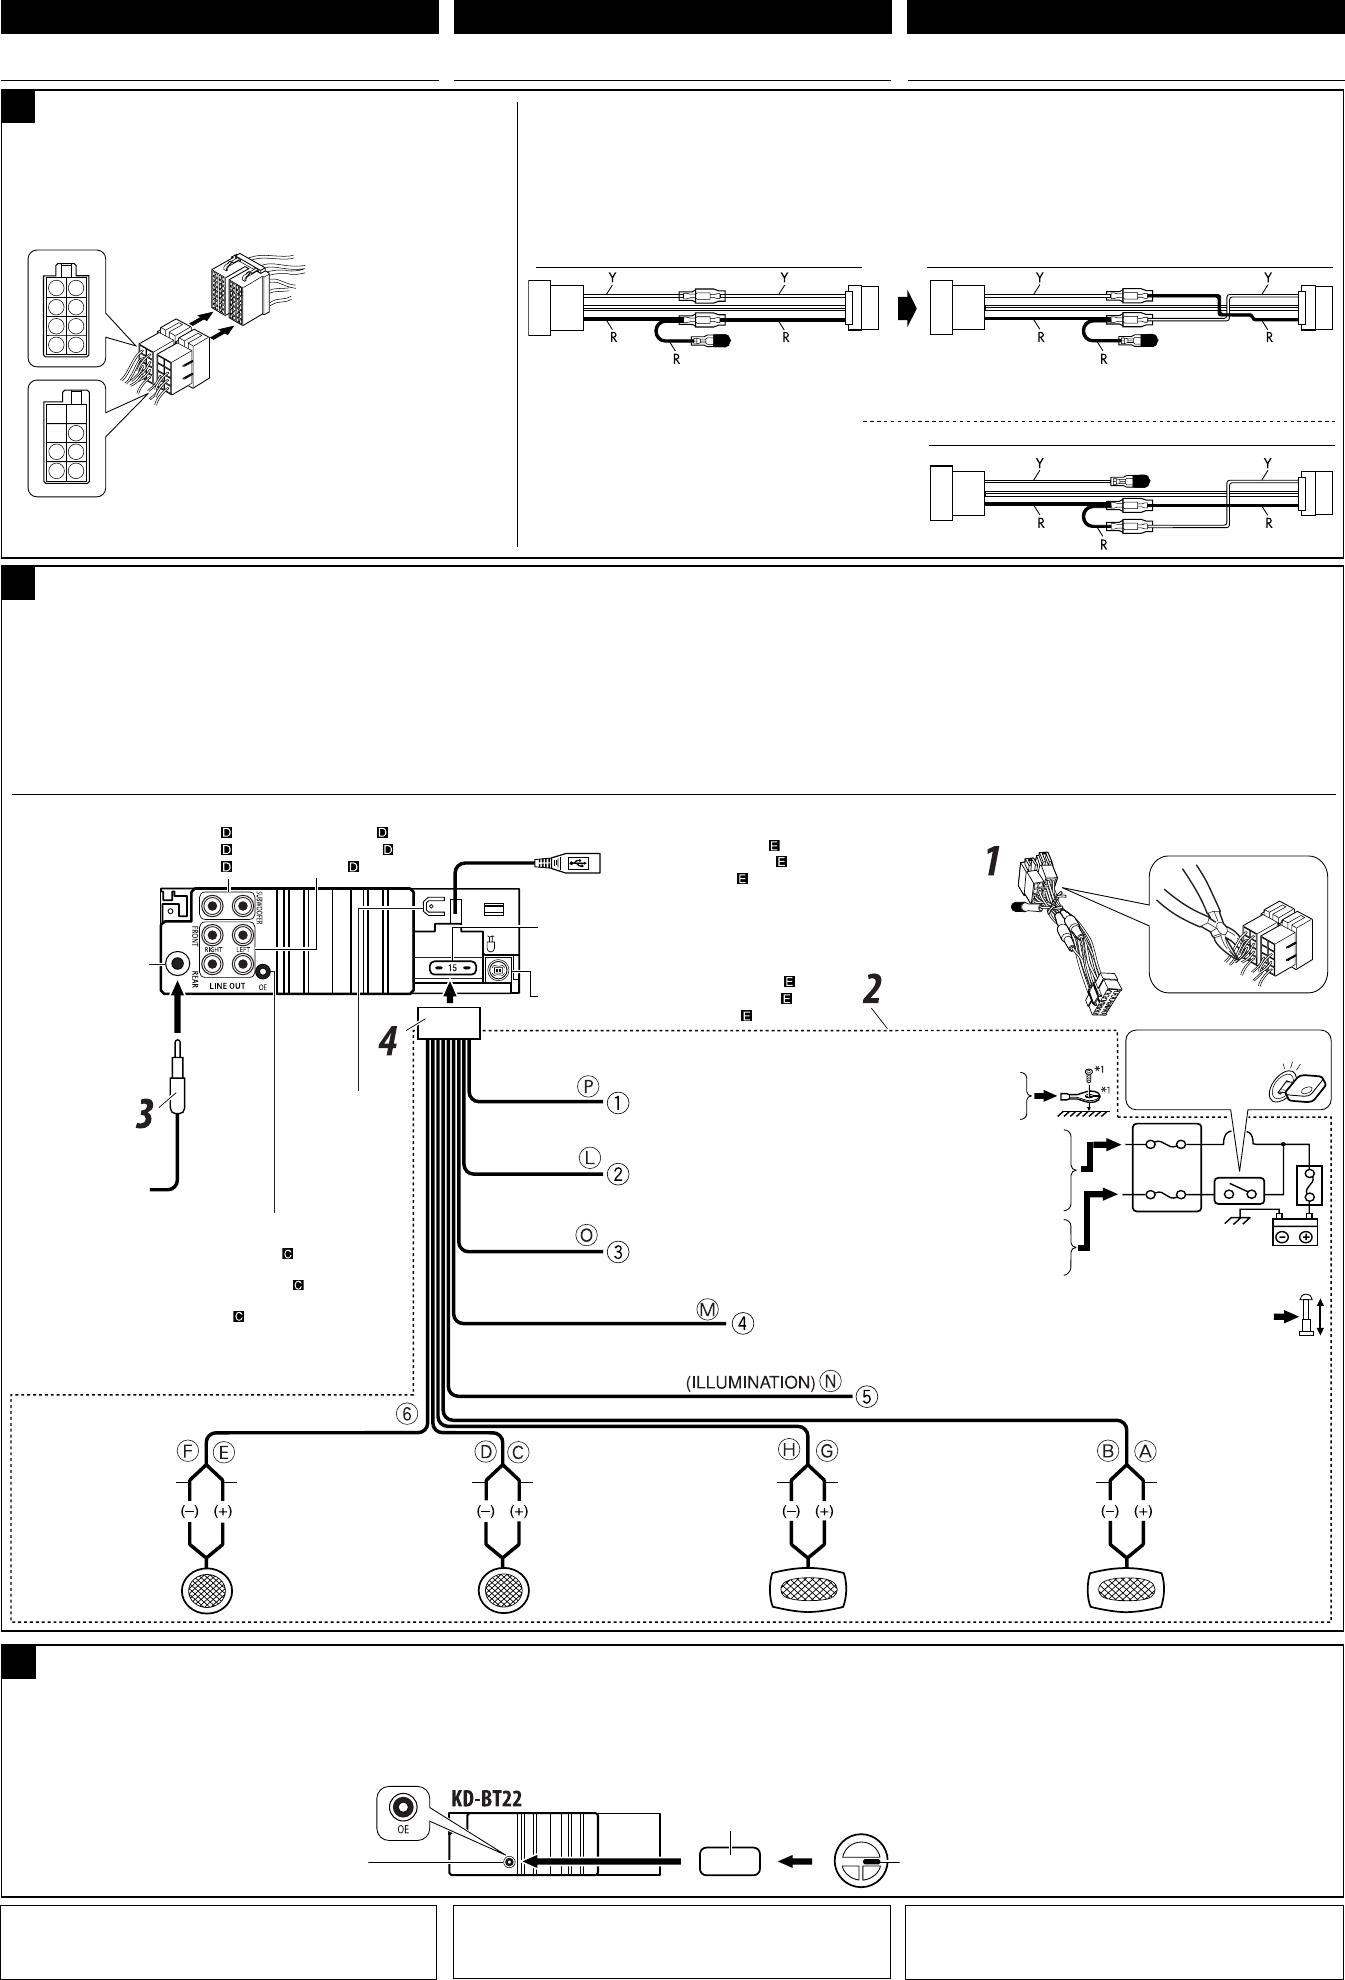 JVC KD BT22E Install1 2_KD BT22_008A_f User Manual GET0529 008B